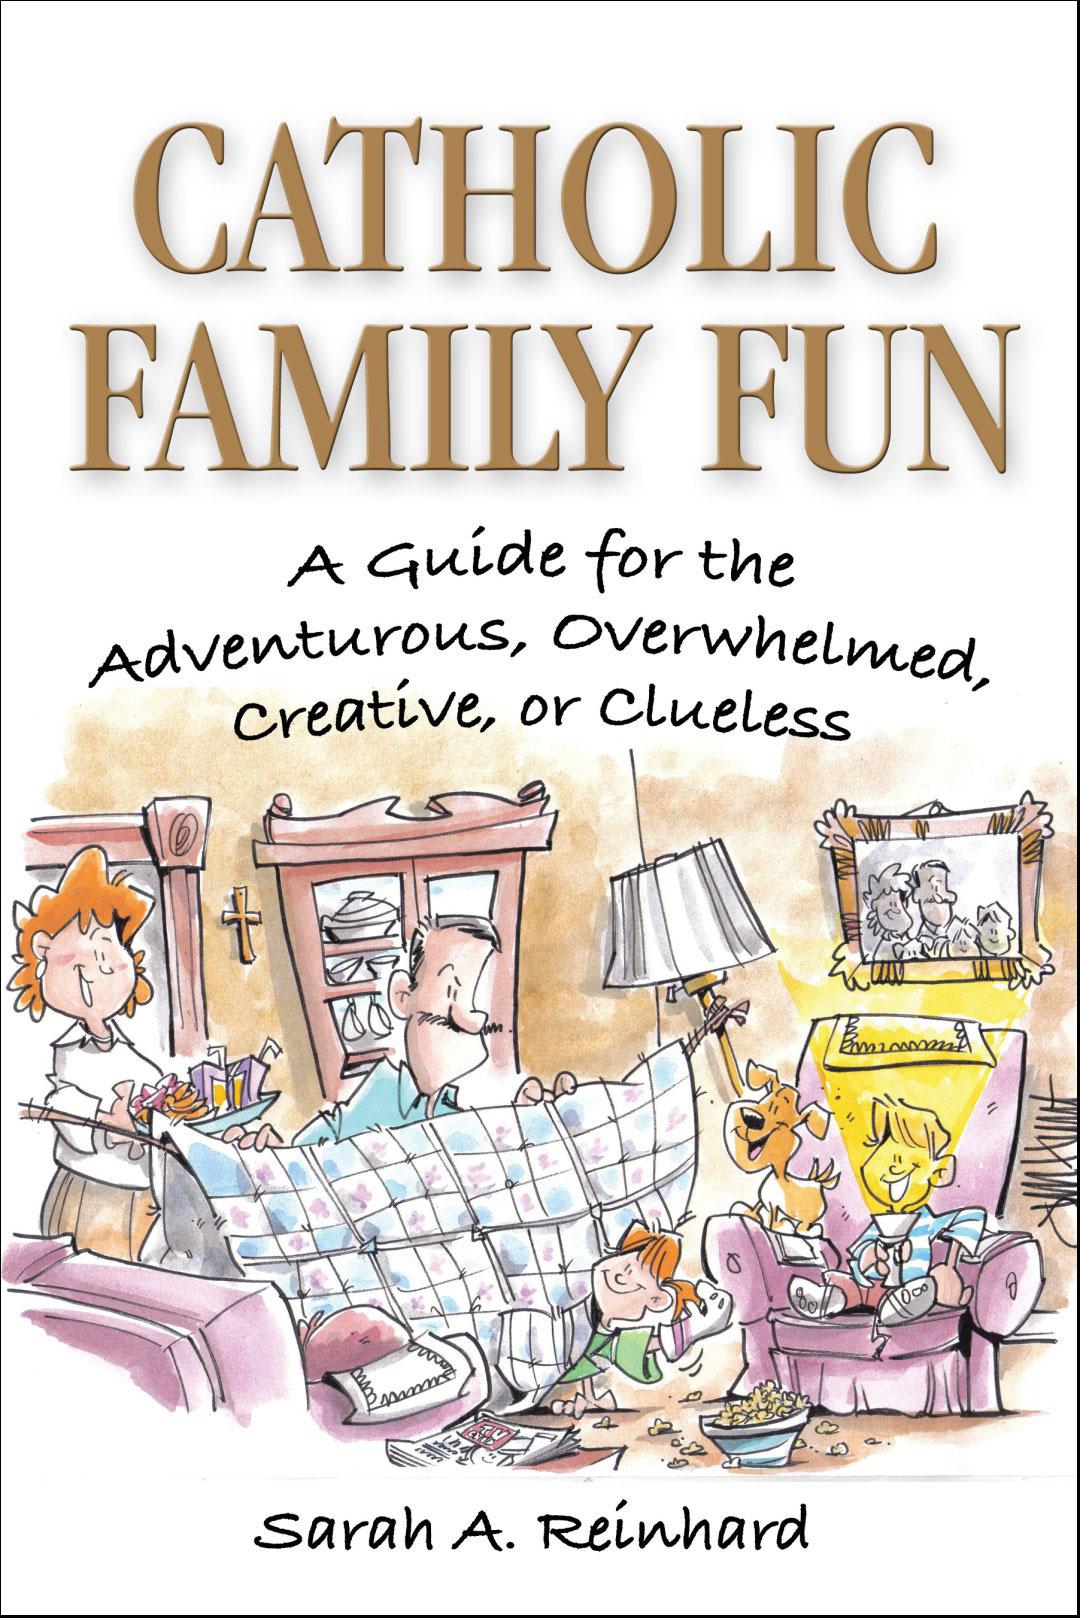 Catholic Family Fun by Sarah A. Reinhard